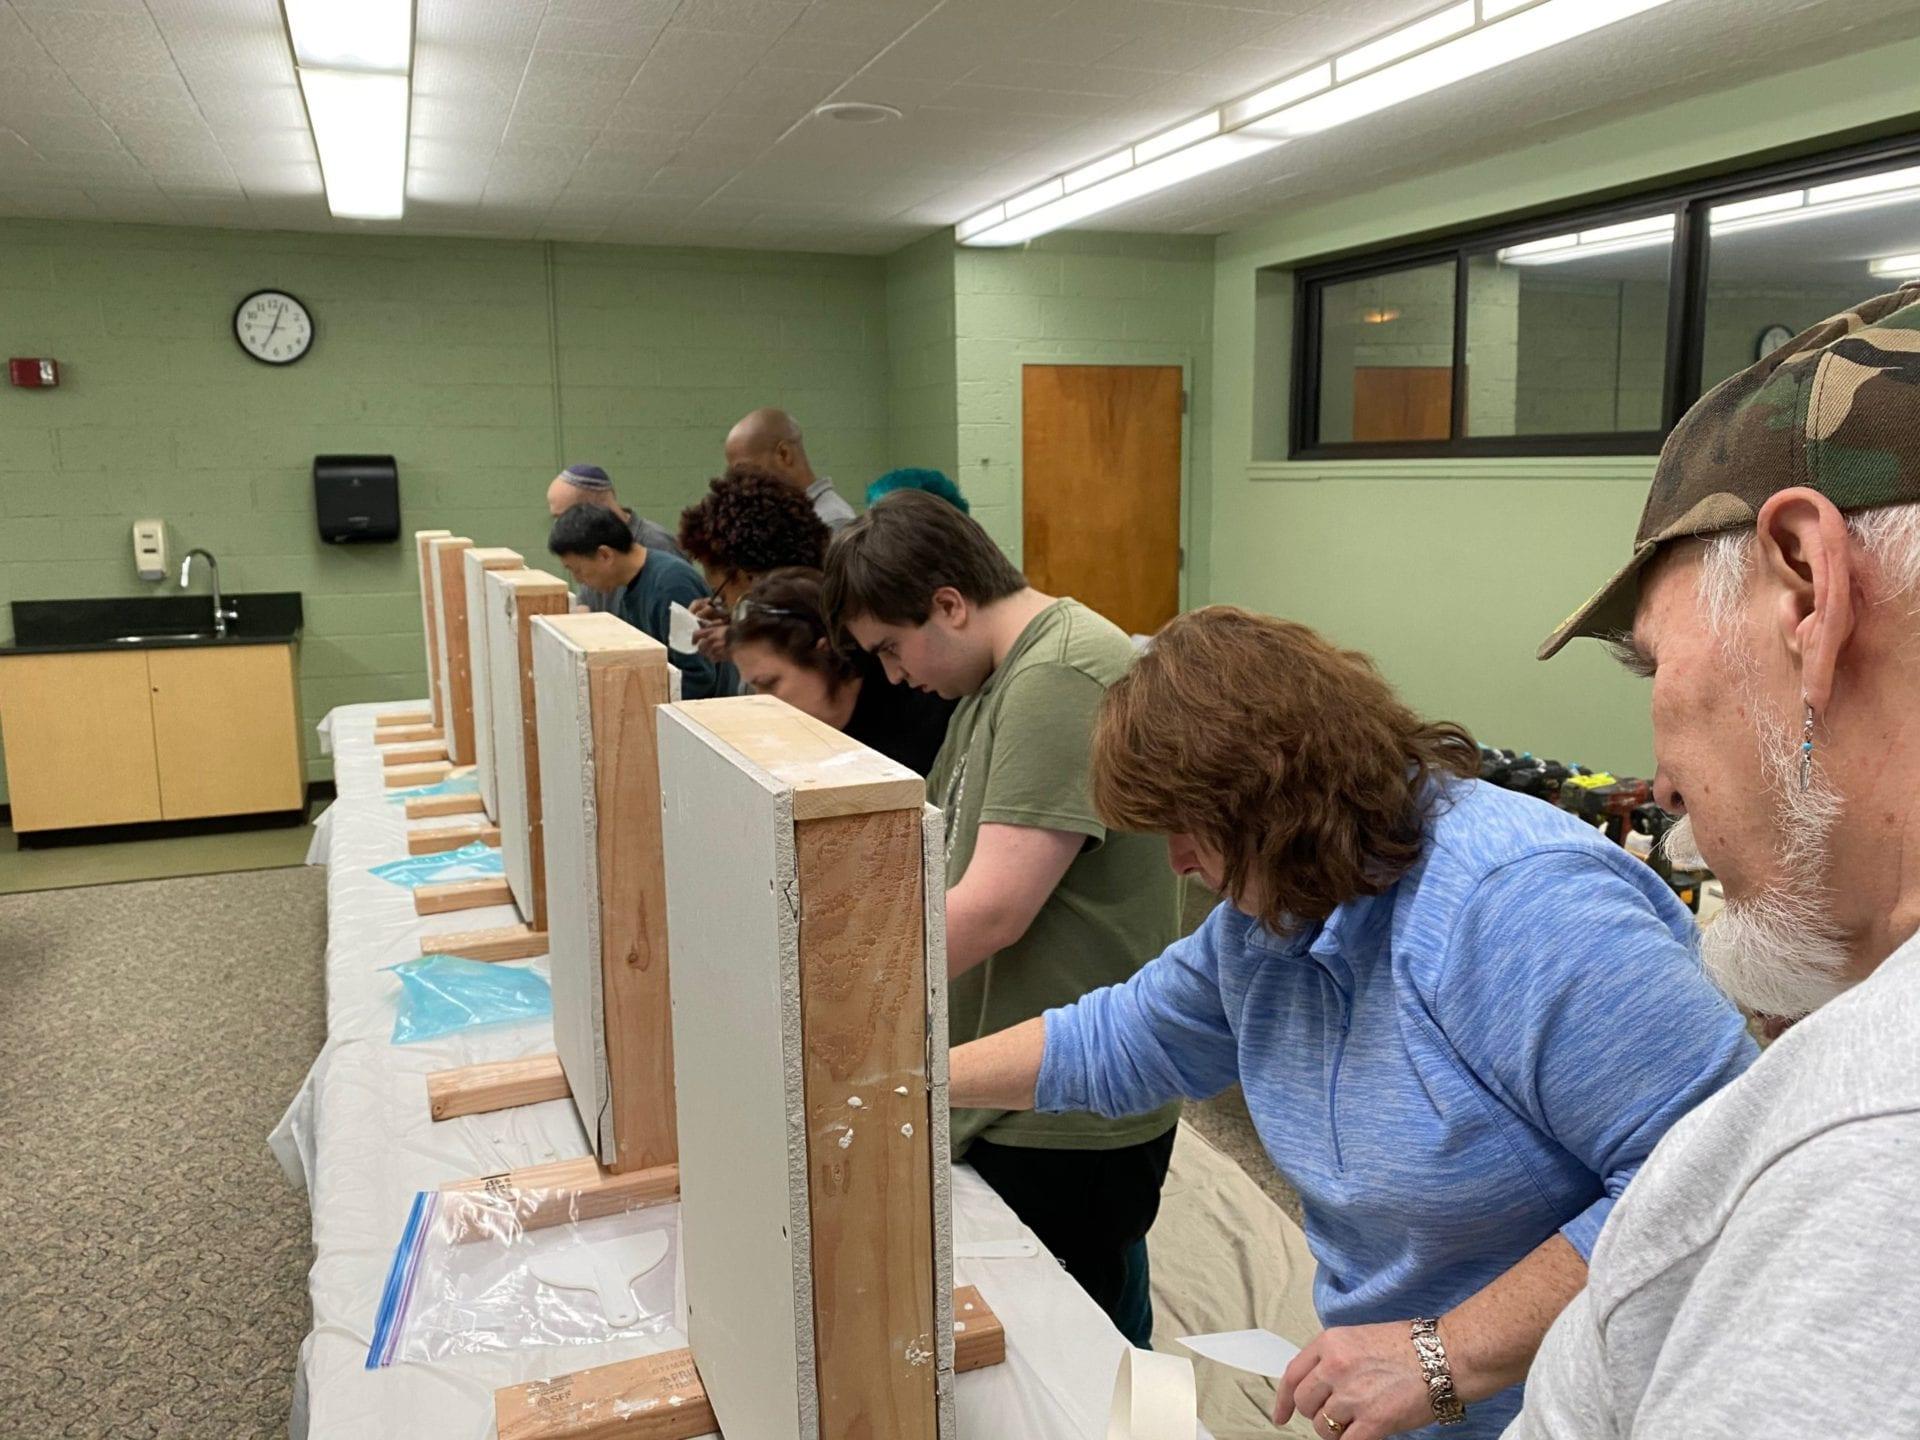 Students working on the wall repair workshop in freeport memorial library